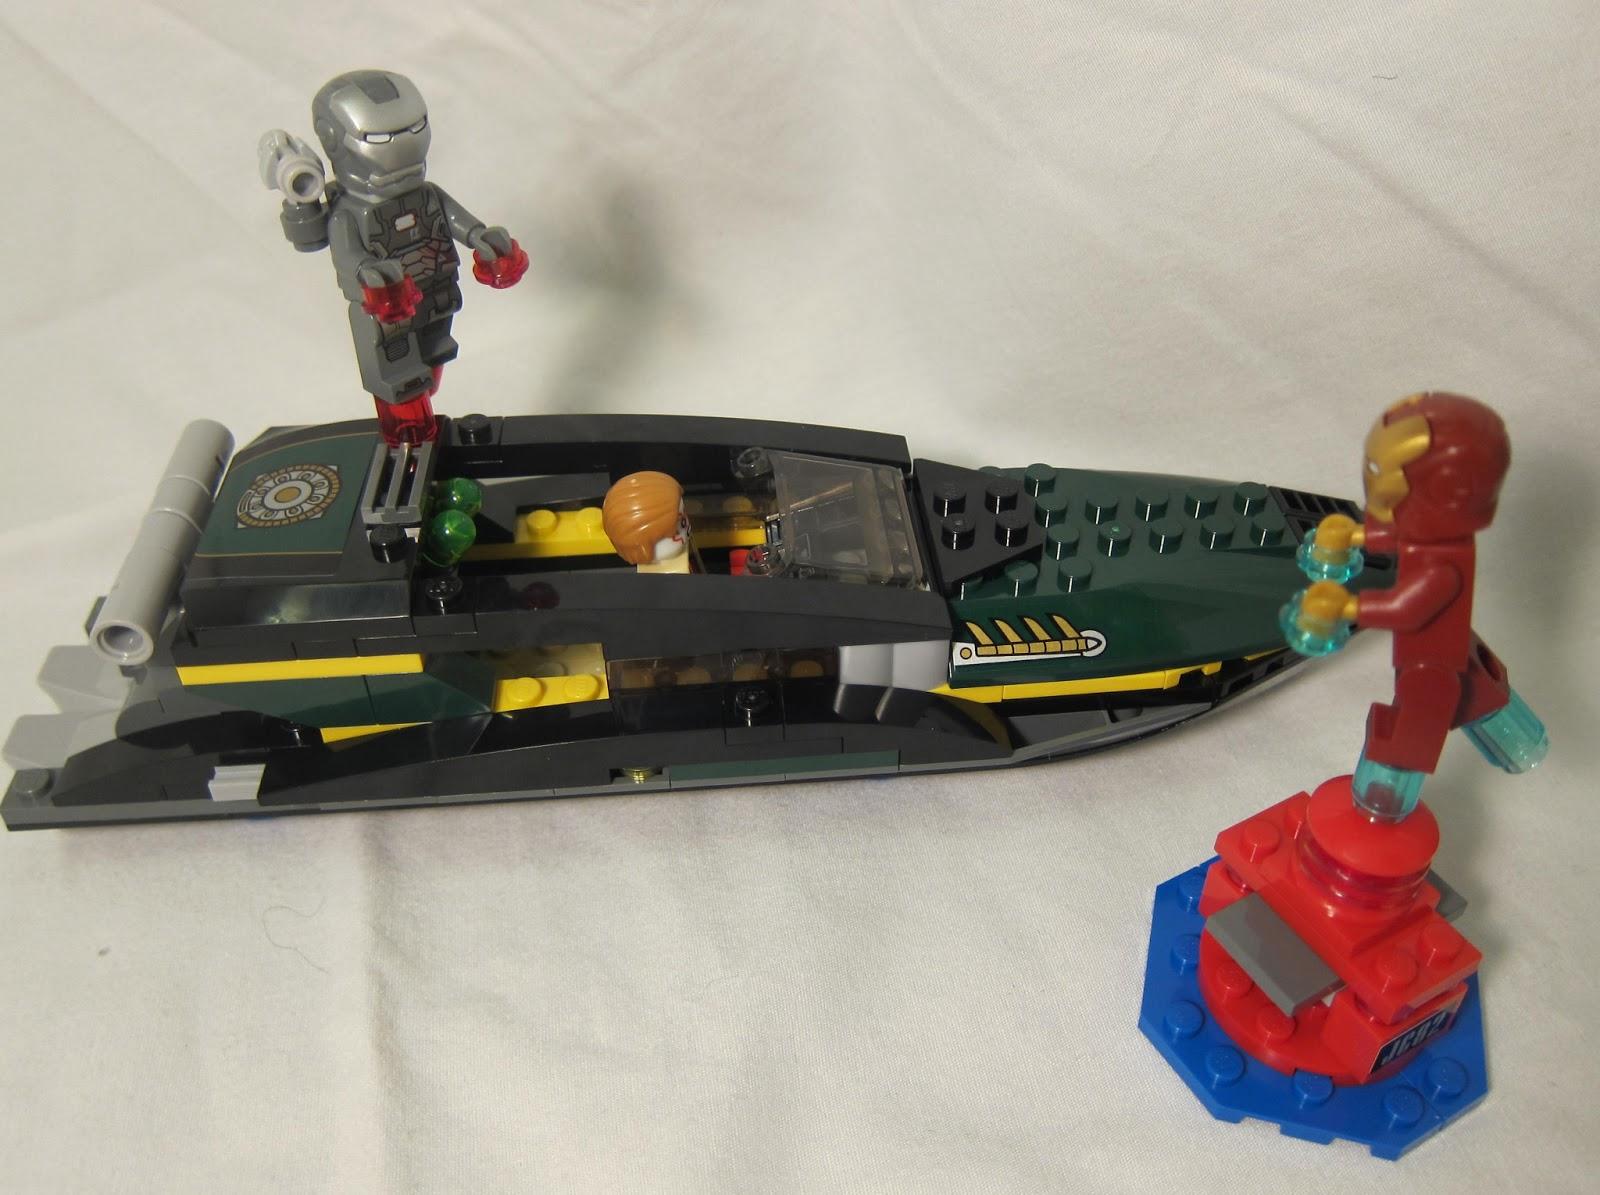 Buried in bricks iron man extremis sea port battle - Lego iron man extremis sea port battle ...